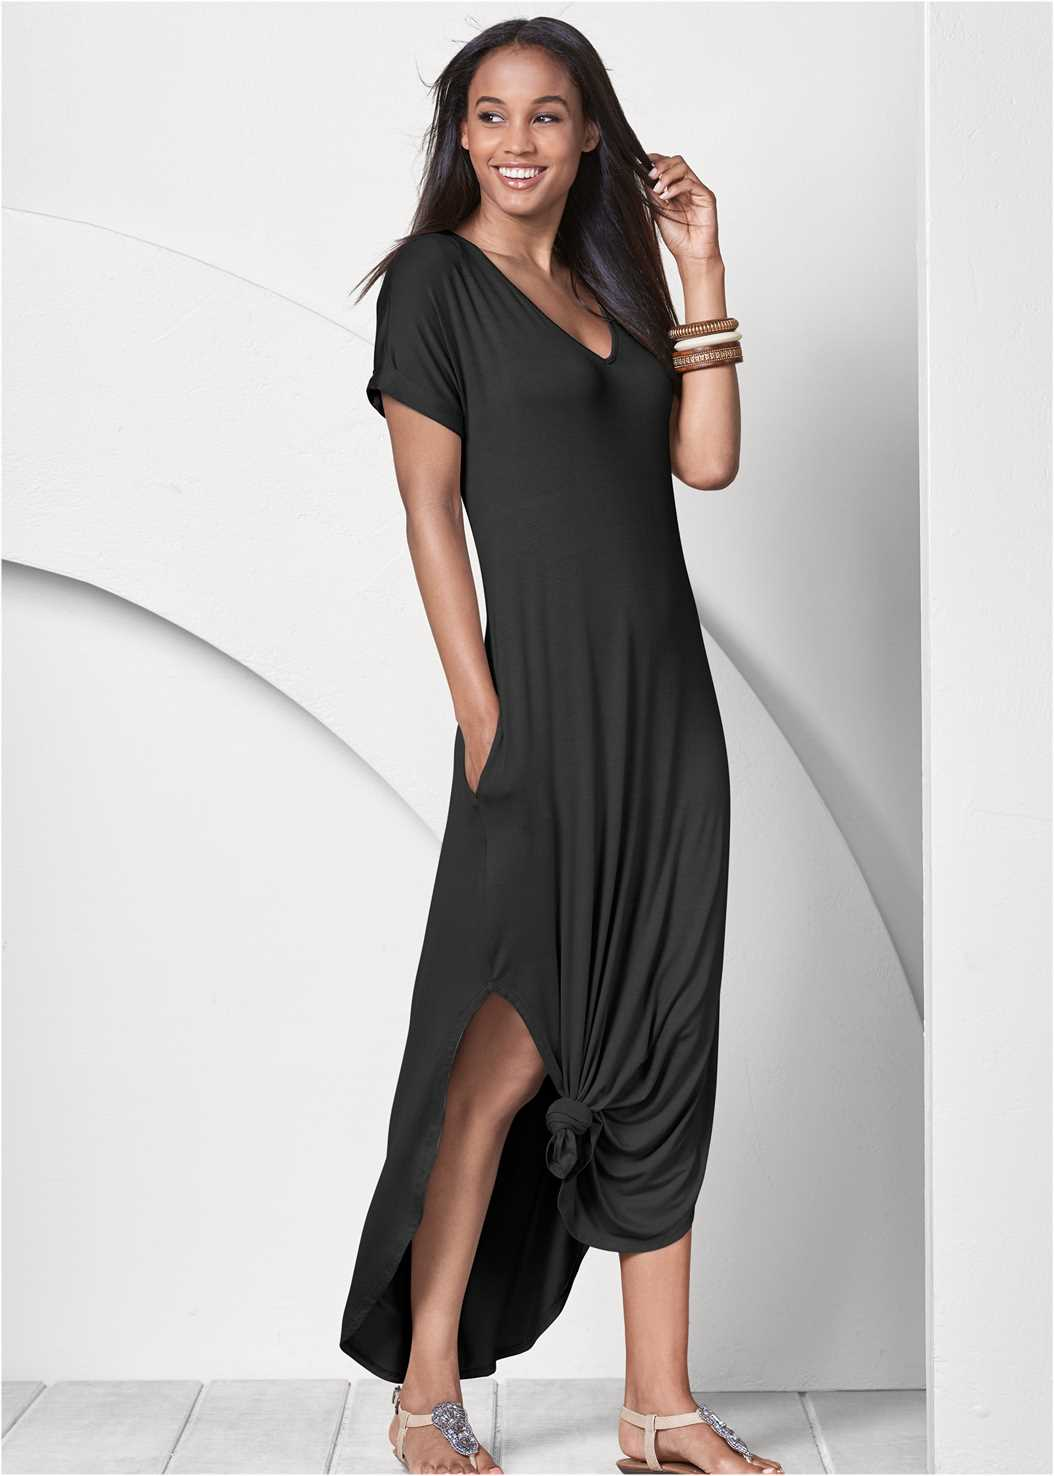 Casual T-Shirt Maxi Dress,Fringe Handbag